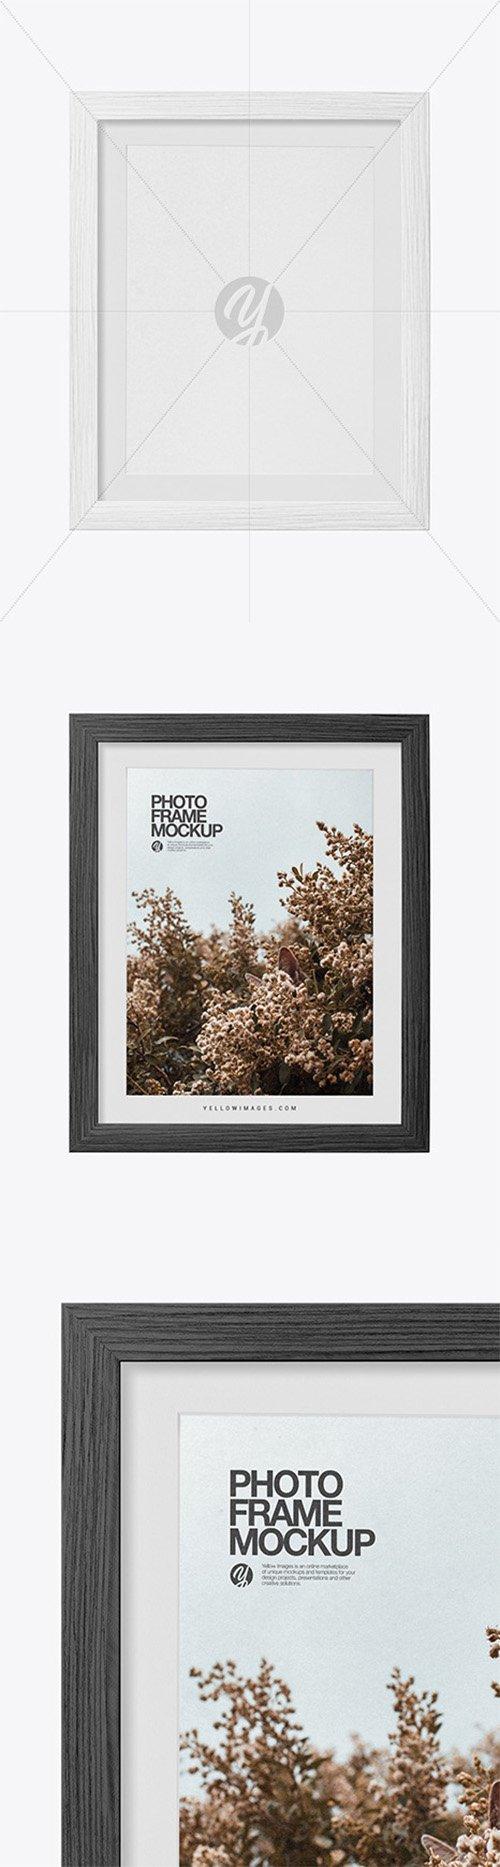 Textured Photo Frame Mockup 61002